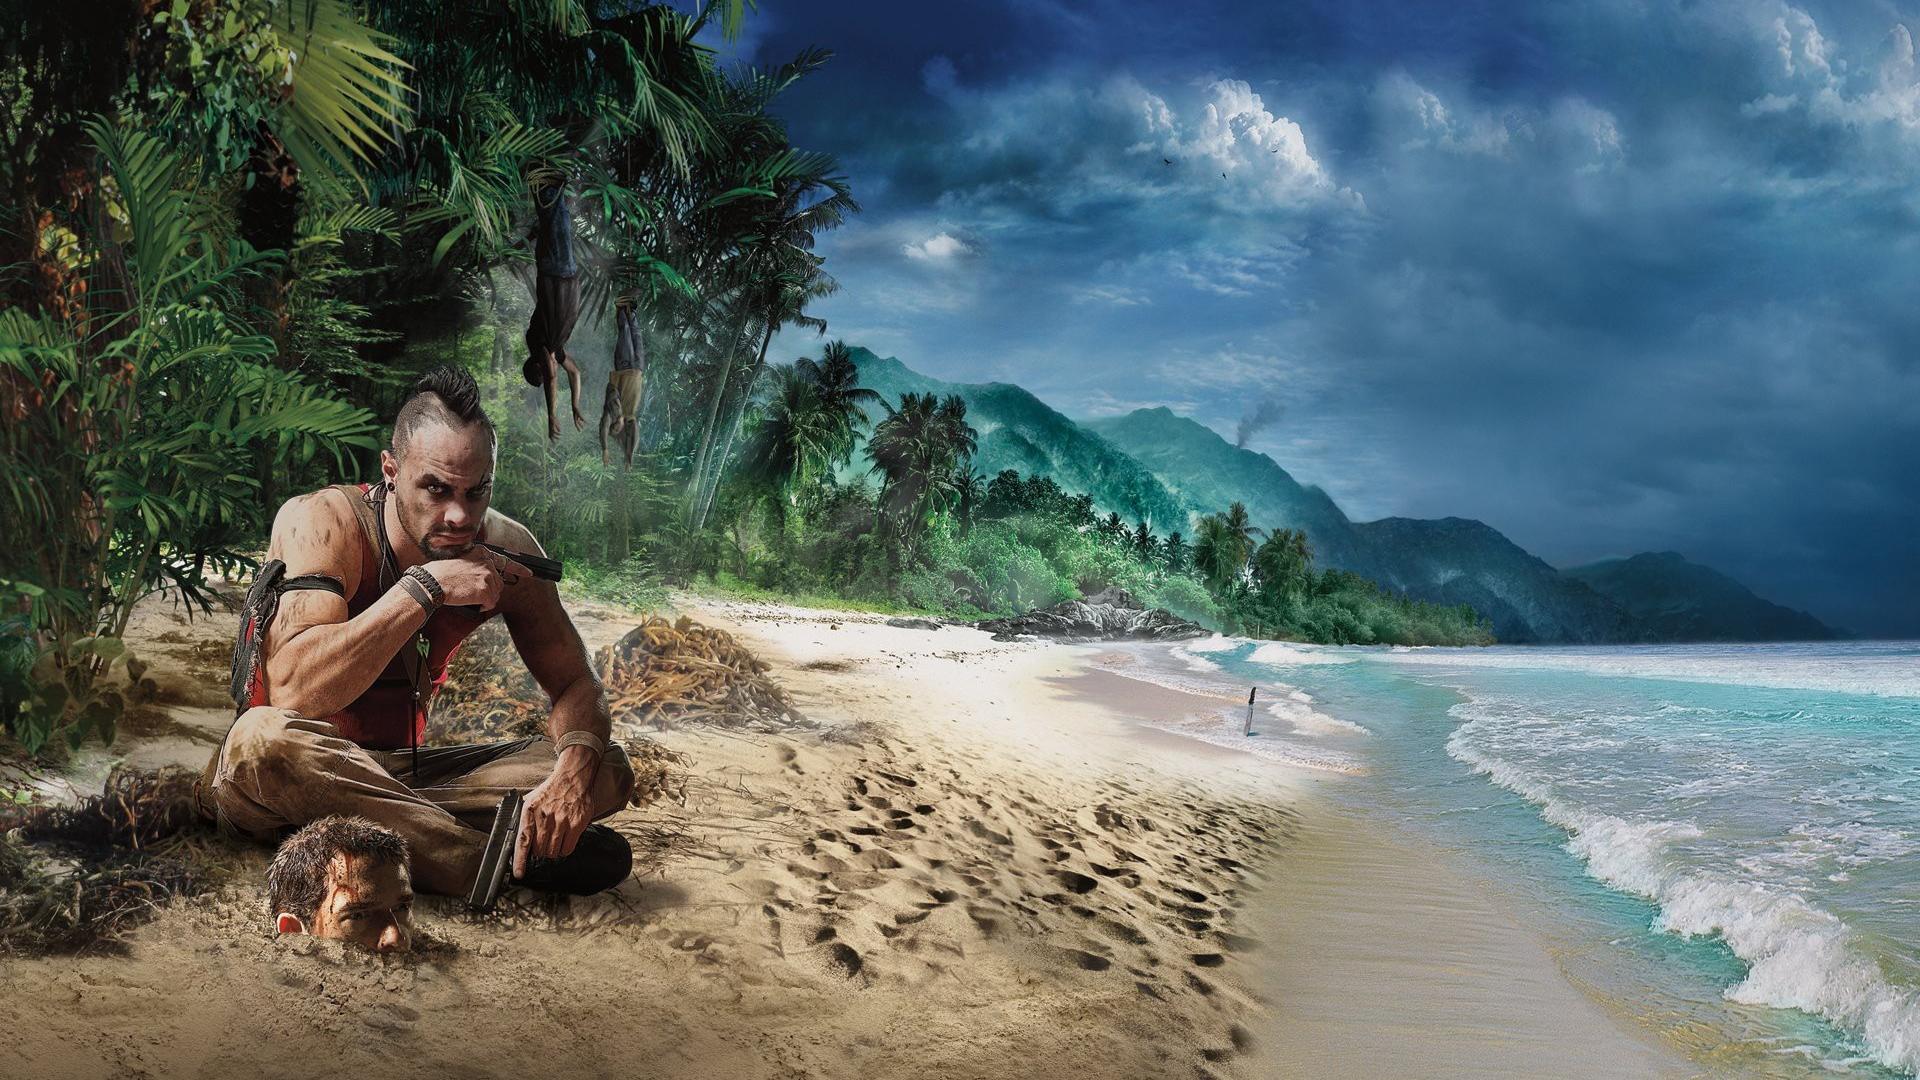 Far-Cry-3-Beach-1080x1920.jpg